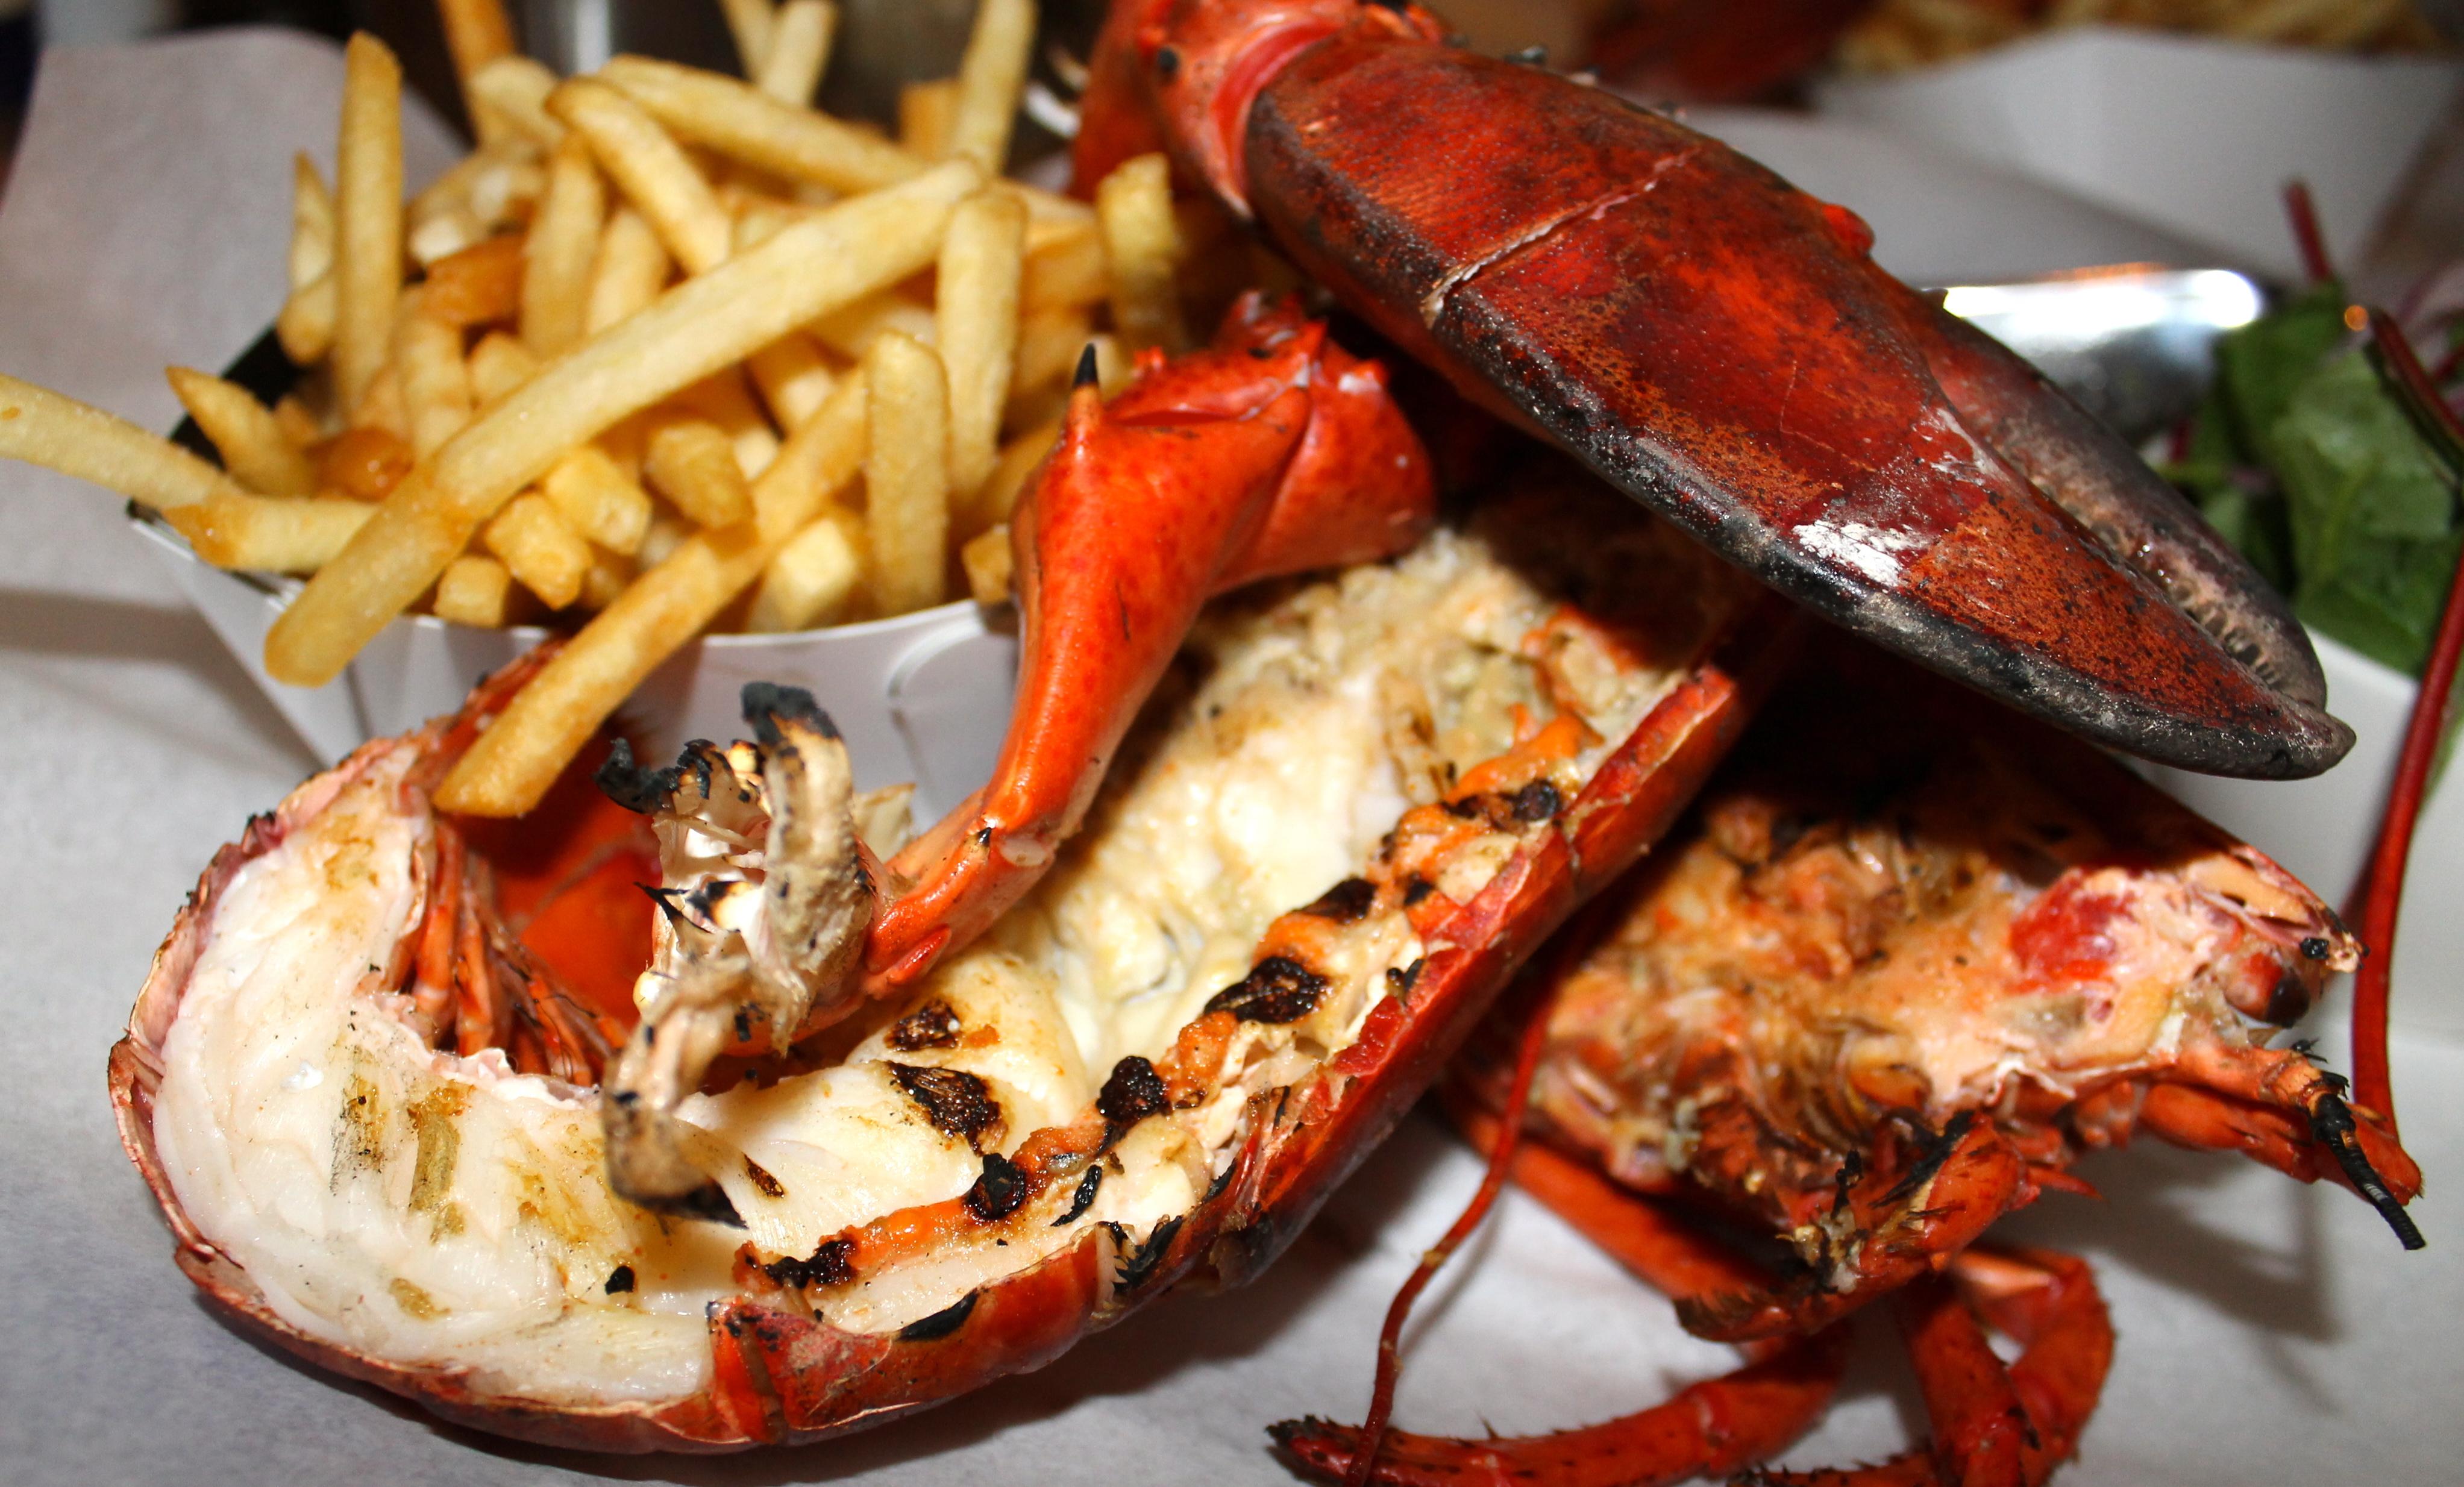 Lobster Roll The Affair | Lobster House